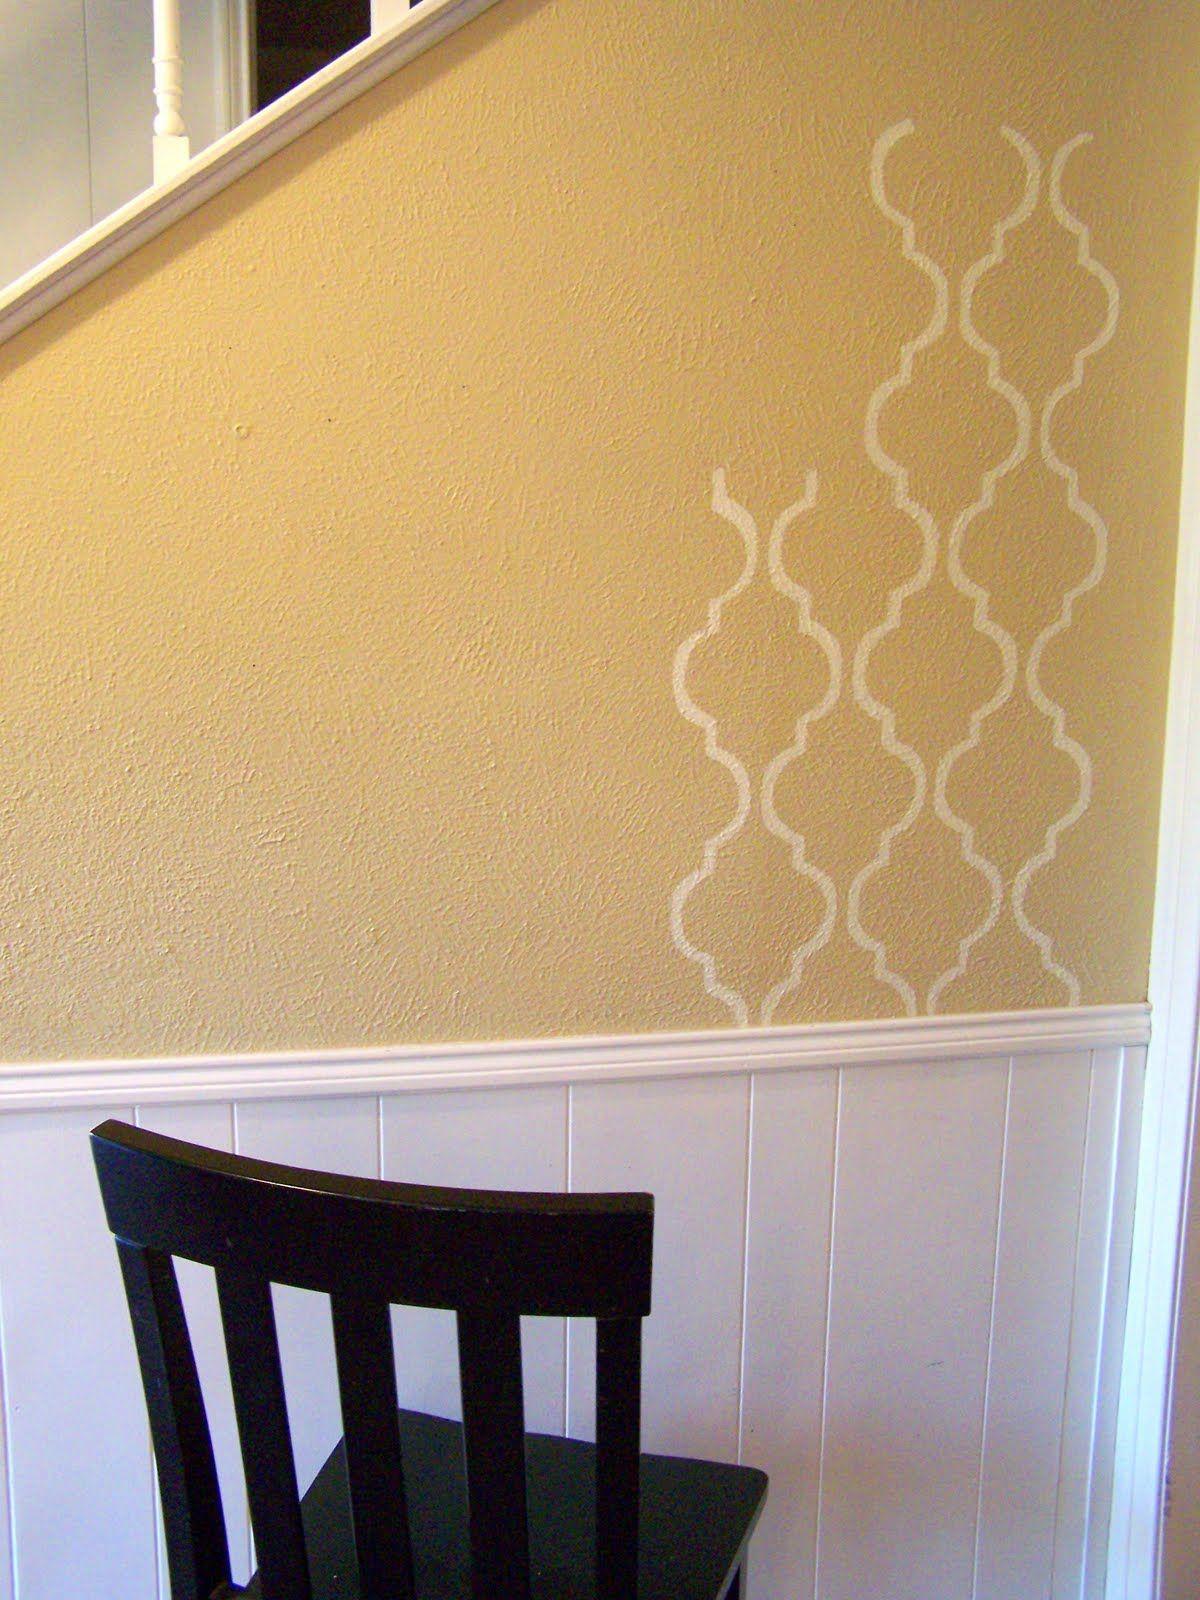 Idiot Proof) Painted Wallpaper w/ DIY stencil | PAINT IT | Pinterest ...